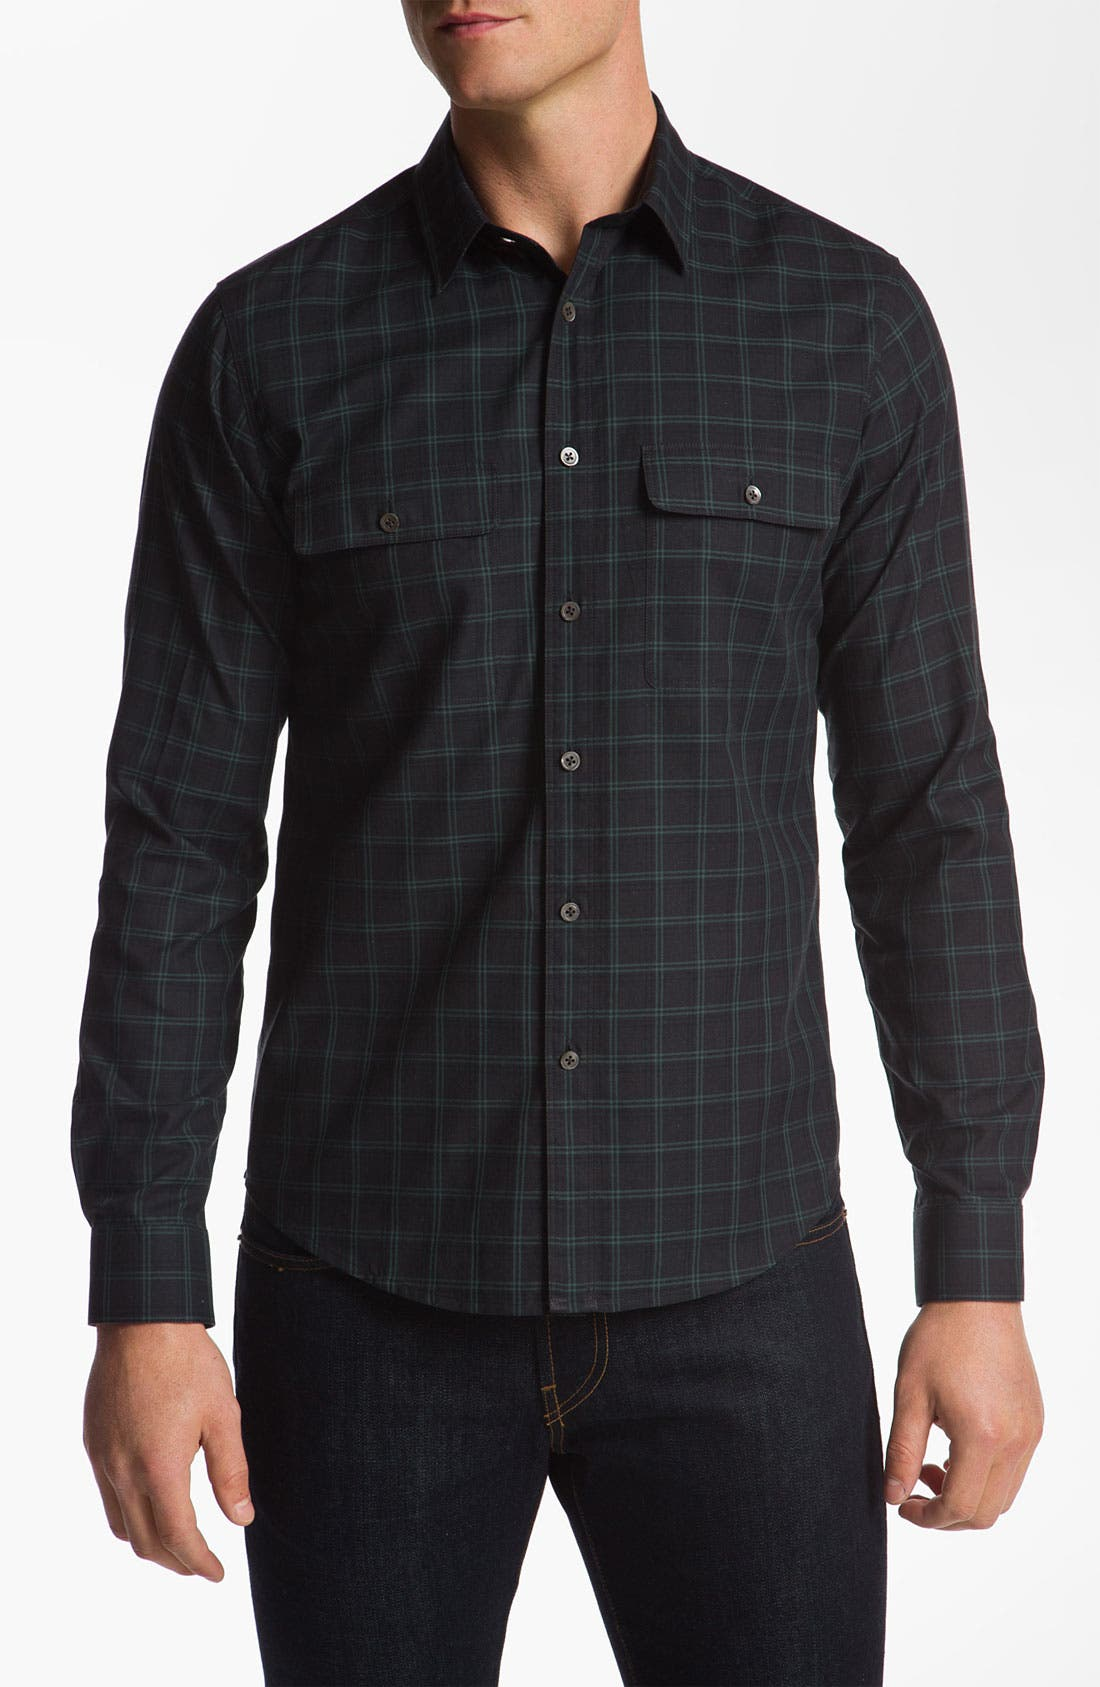 Alternate Image 1 Selected - Theory 'Morvan' Woven Shirt